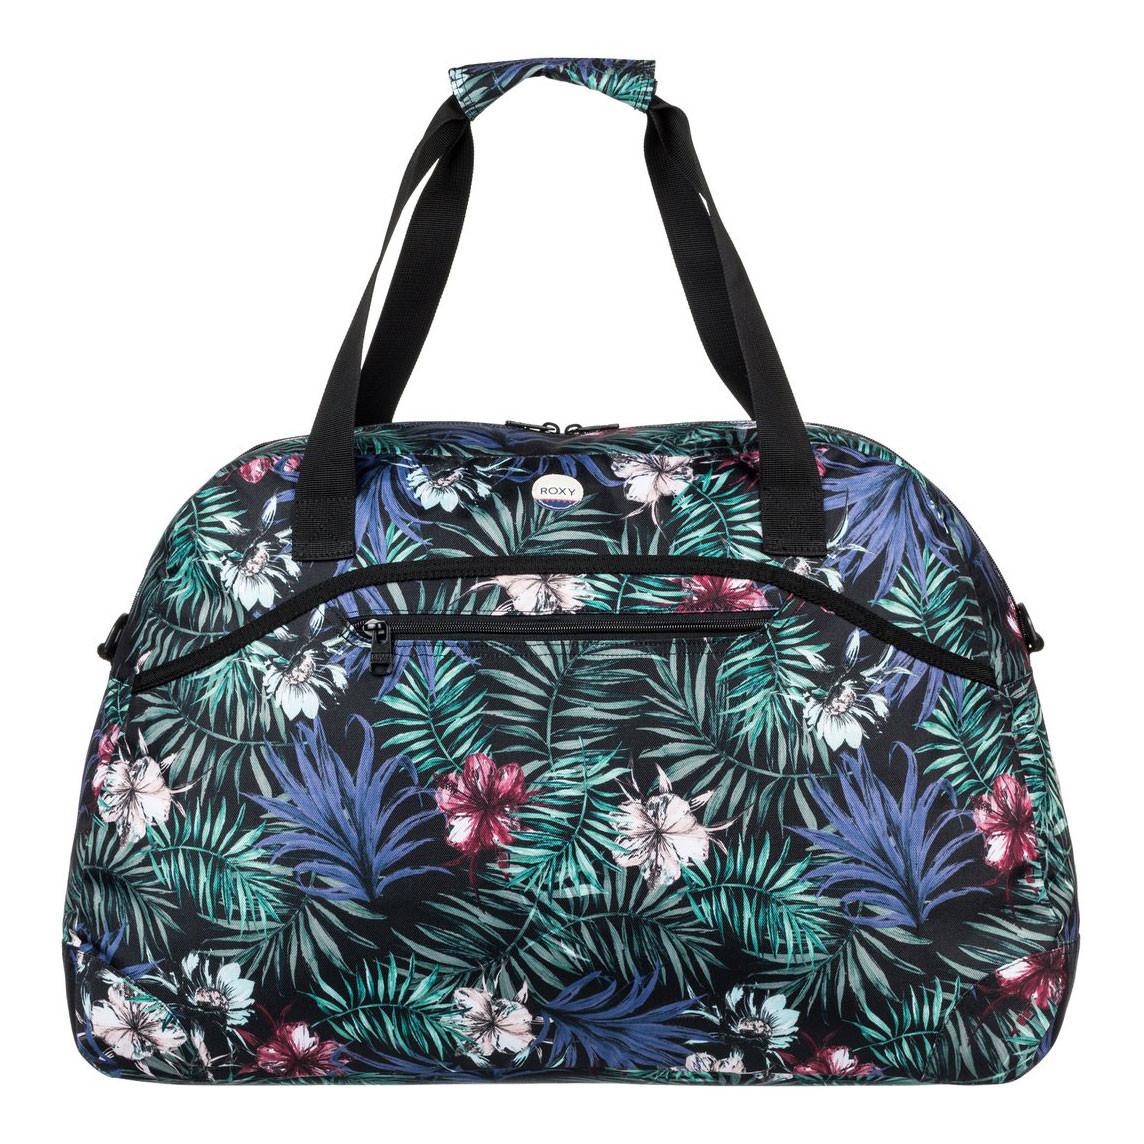 Cestovní taška Roxy Too Far anthracite swim belharra flowe